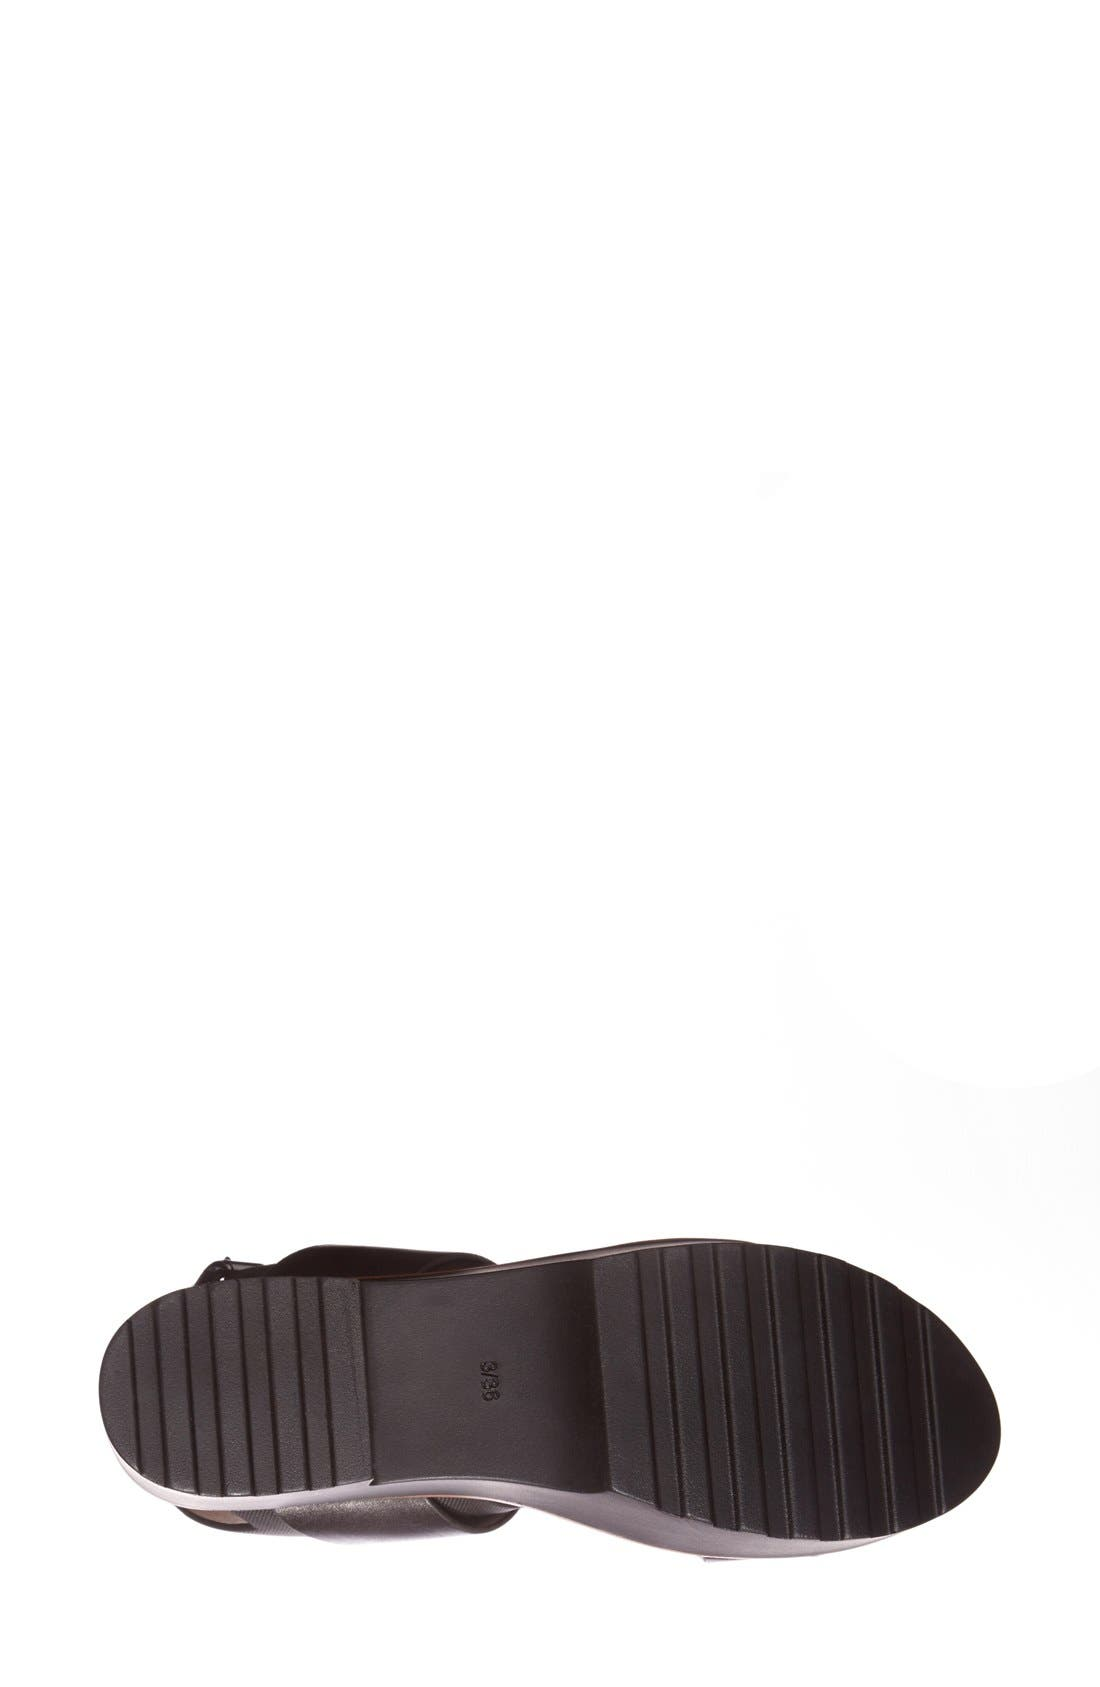 Alternate Image 4  - Topshop 'Ninja' Platform Sandal (Women)